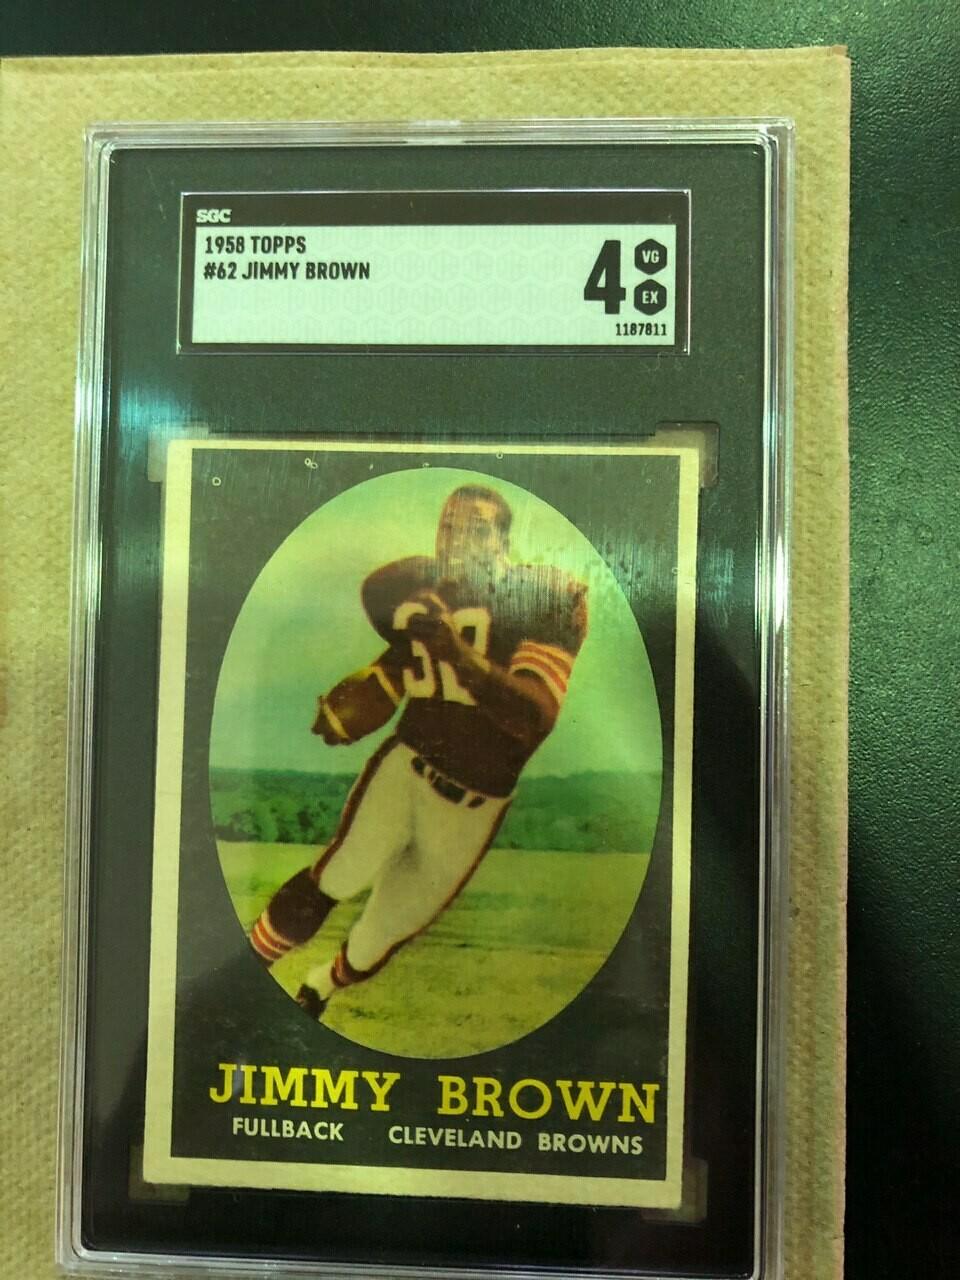 1958 Topps #62 Jim Brown rookie SGC graded 4, $595